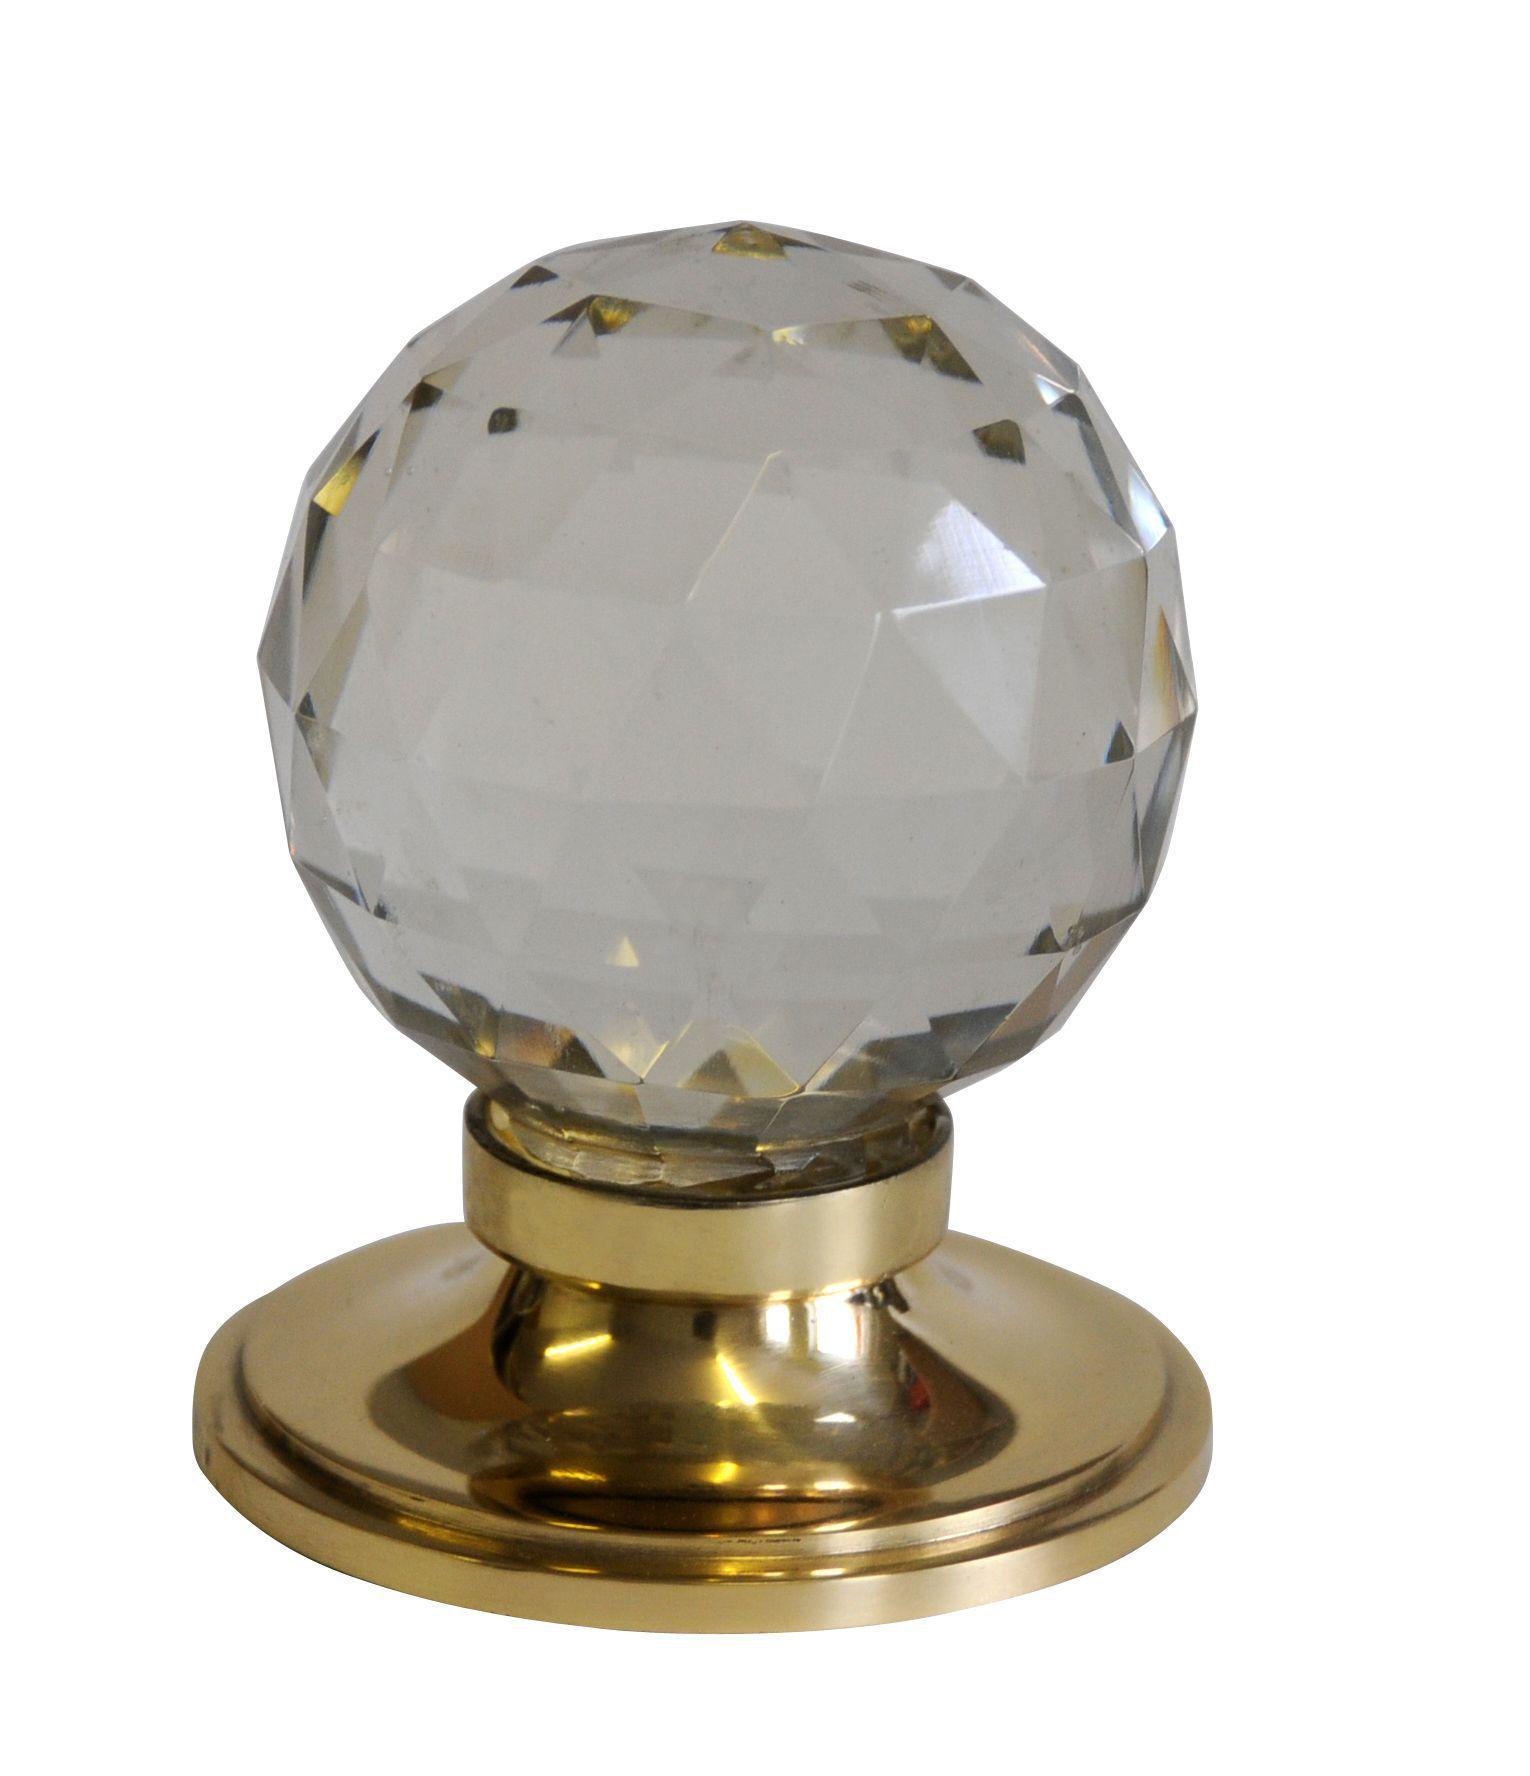 Premier Polished Brass Effect External Round Latch Door Knob, 1